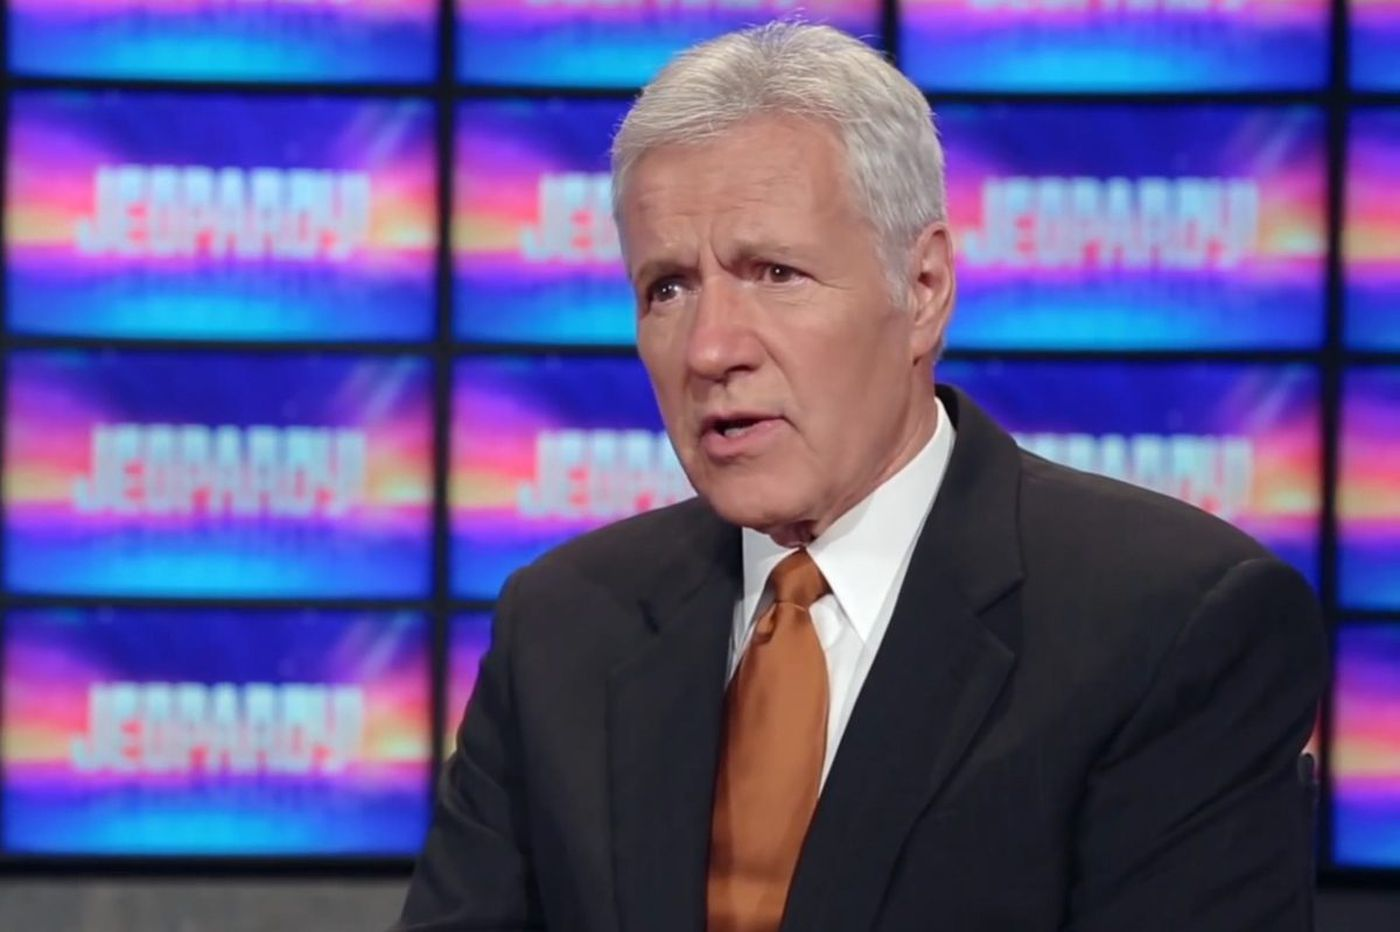 'Jeopardy!' host Alex Trebek to moderate a Pa. gubernatorial debate